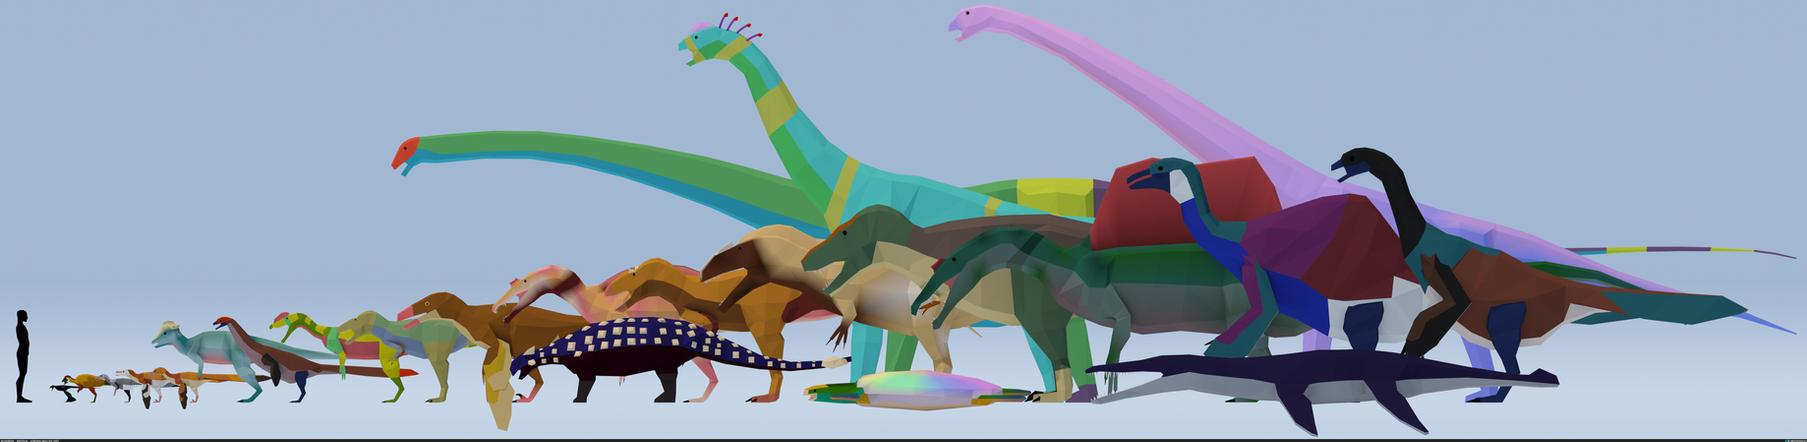 Reptilia v5 by MithosKuu